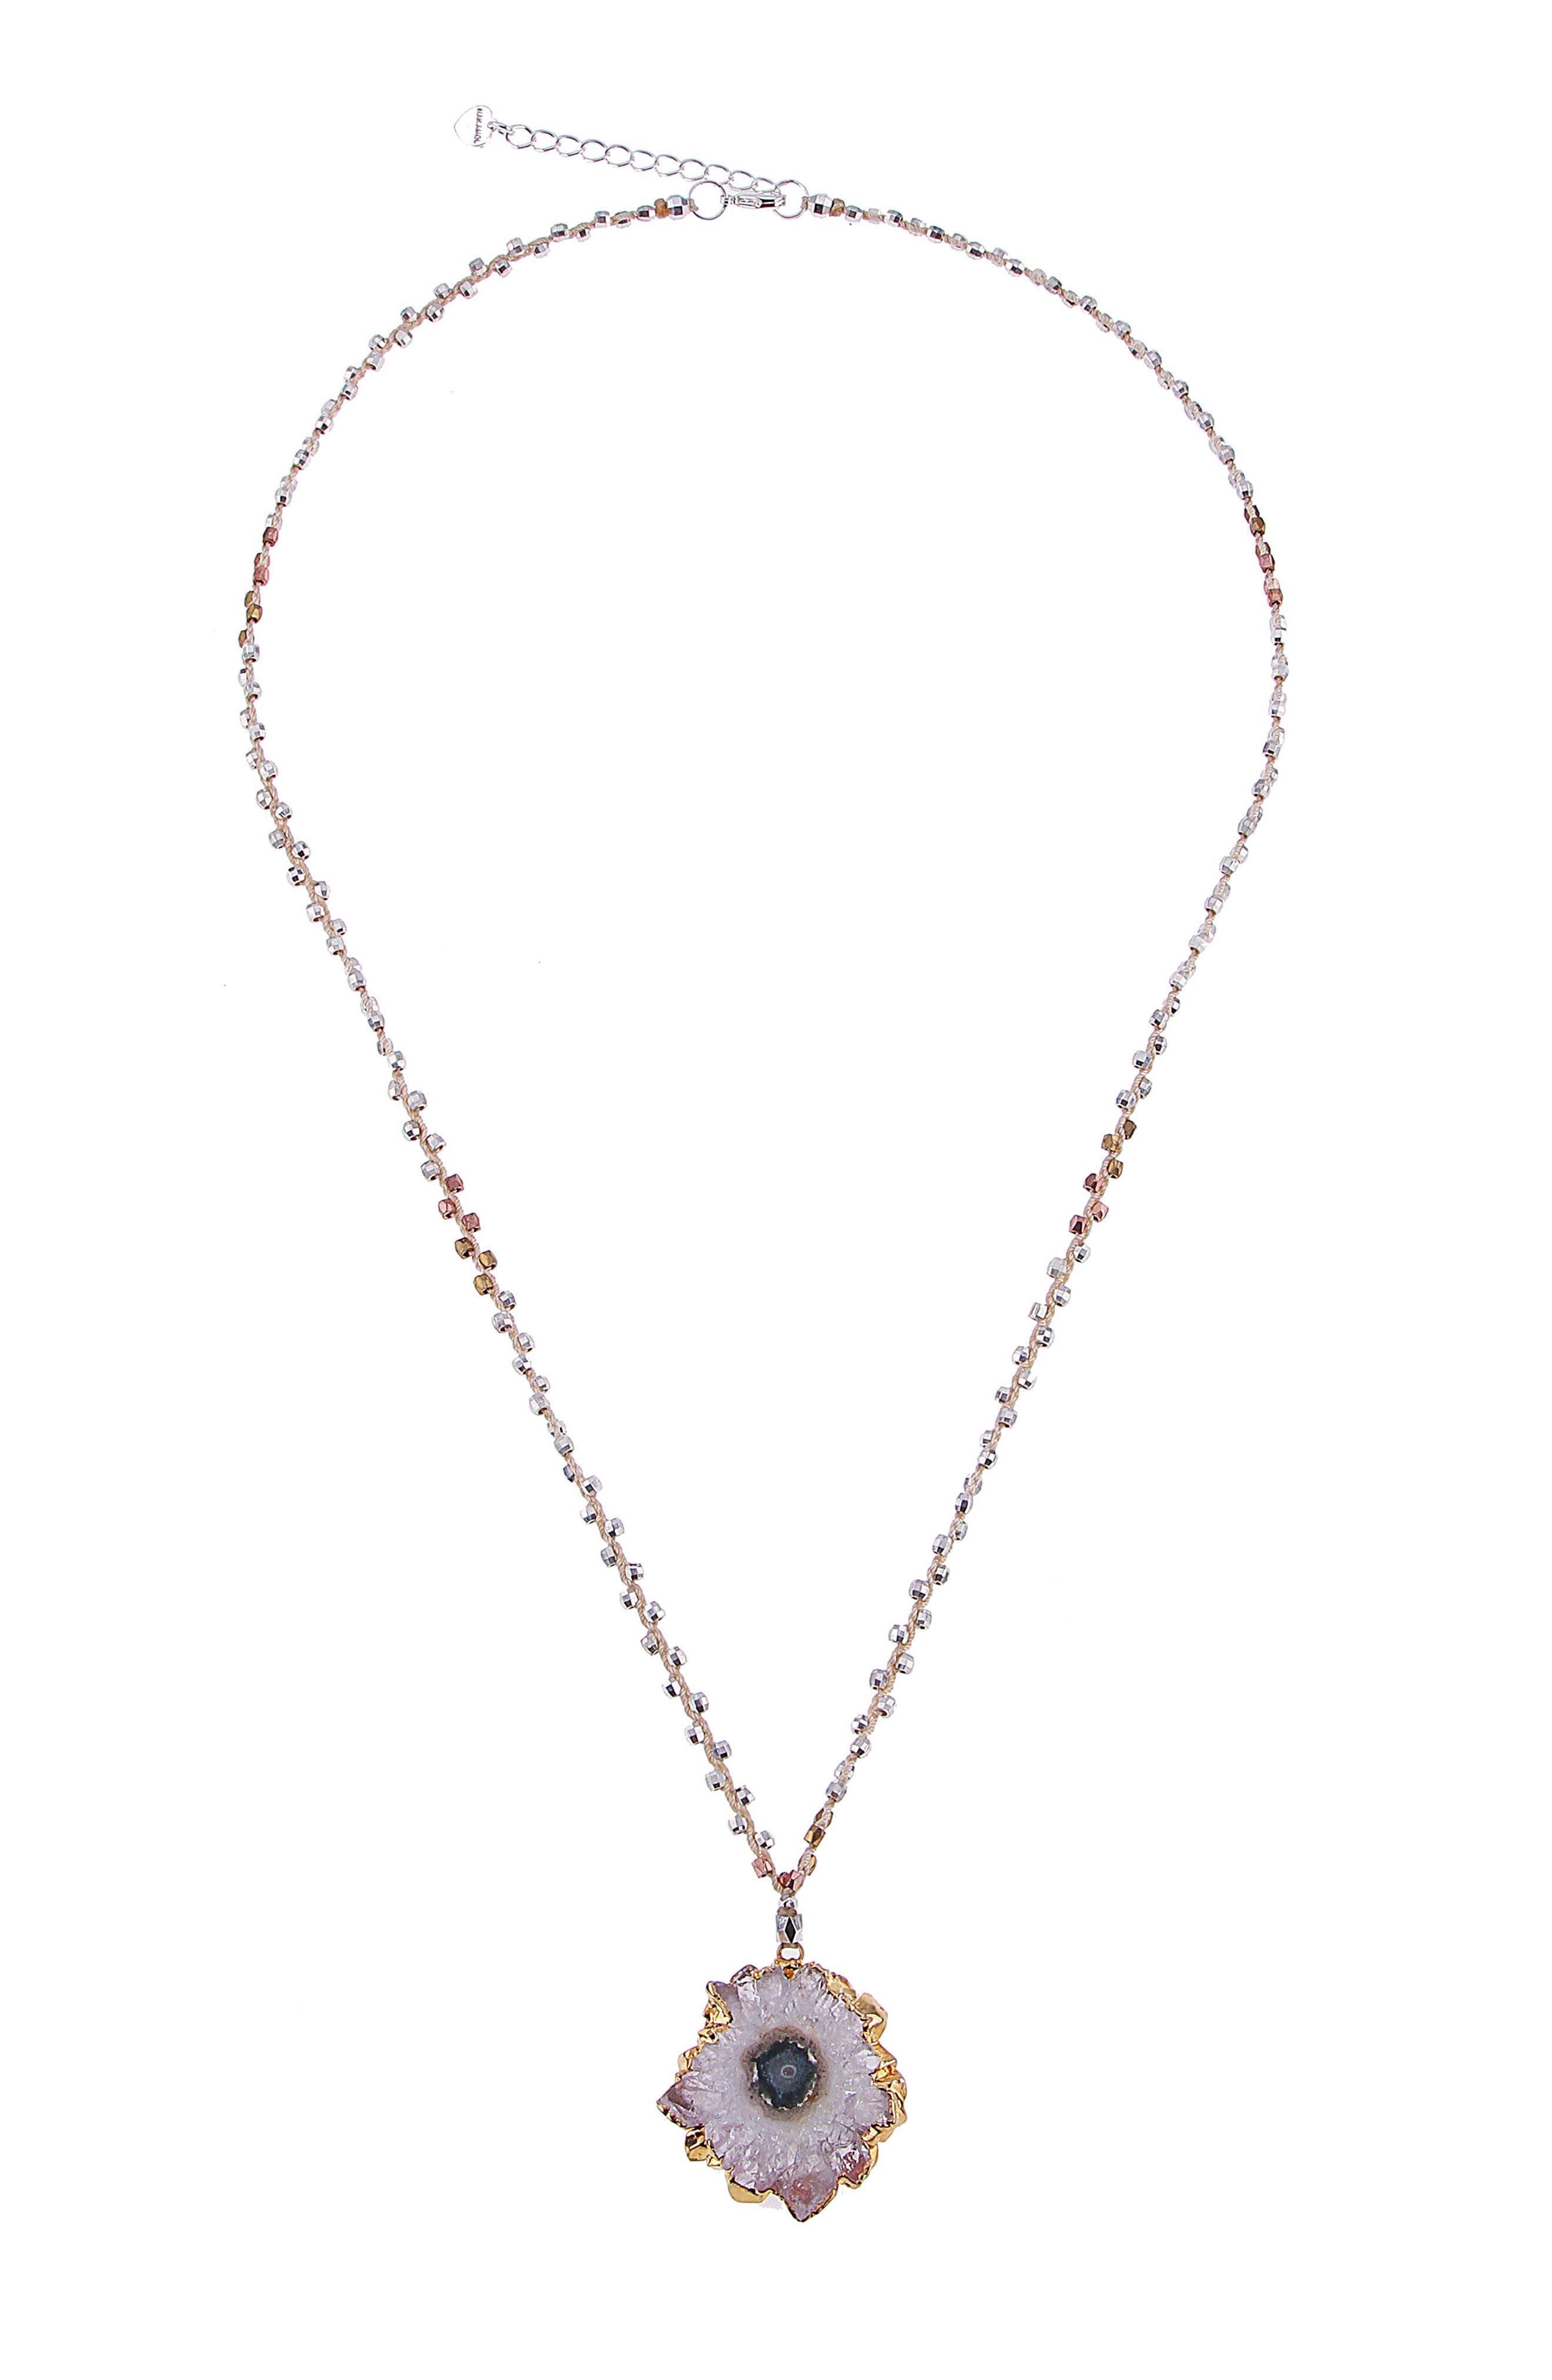 Cote Amethyst Pendant Necklace,                         Main,                         color, Clear